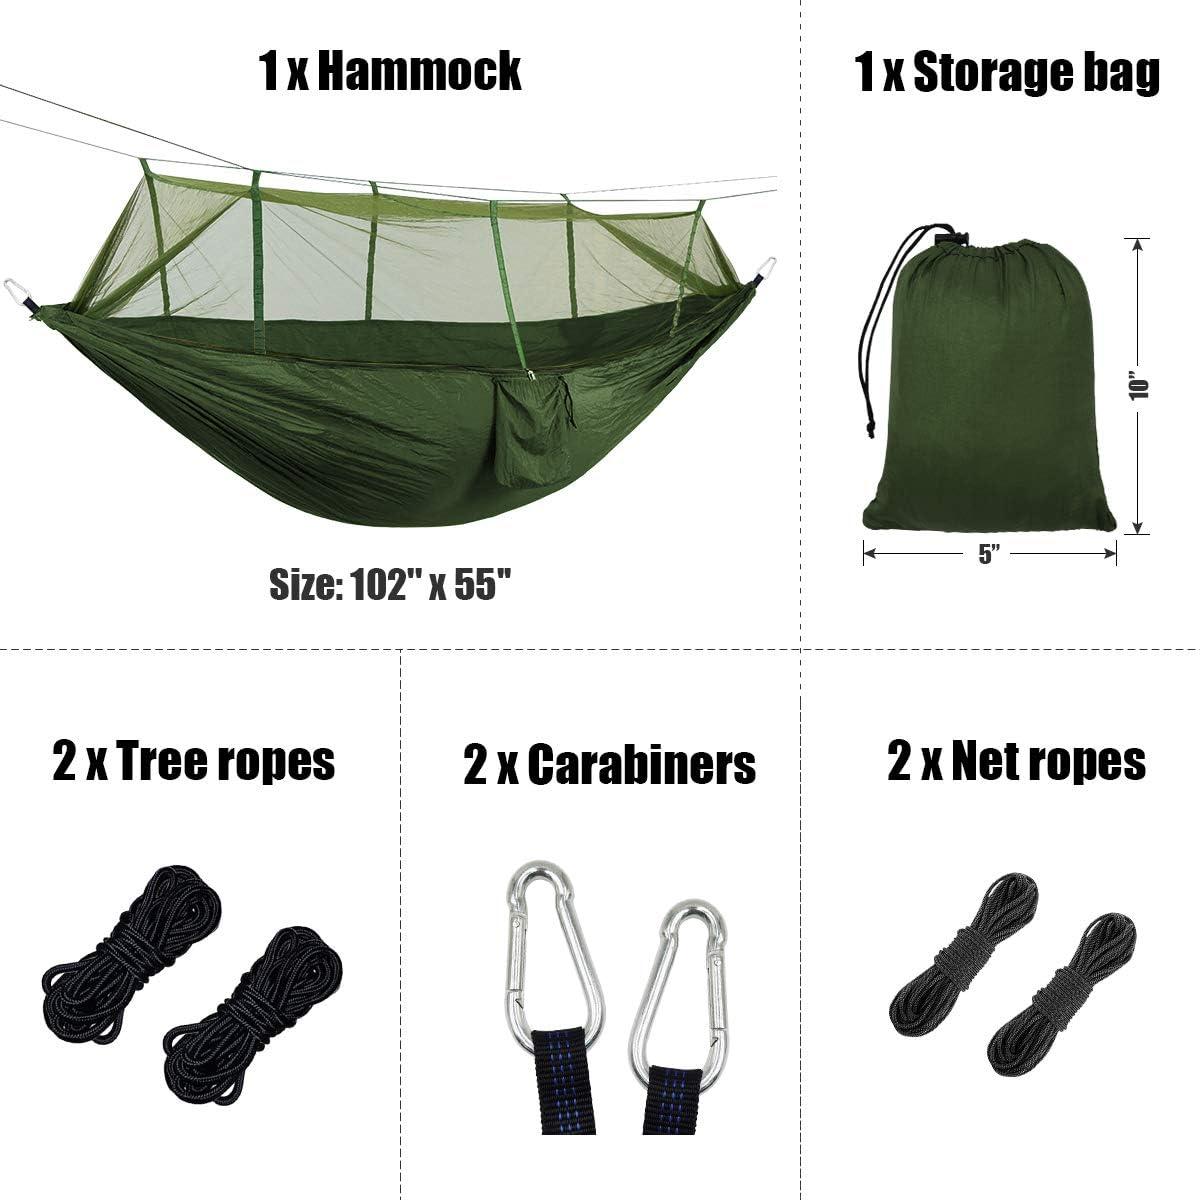 Backpacking Beach Travel Grassman Bug Net Camping Hammock Single Camping Hammock with Tree Ropes Portable Parachute Nylon Hammock for Indoor and Outdoor Camping Hiking